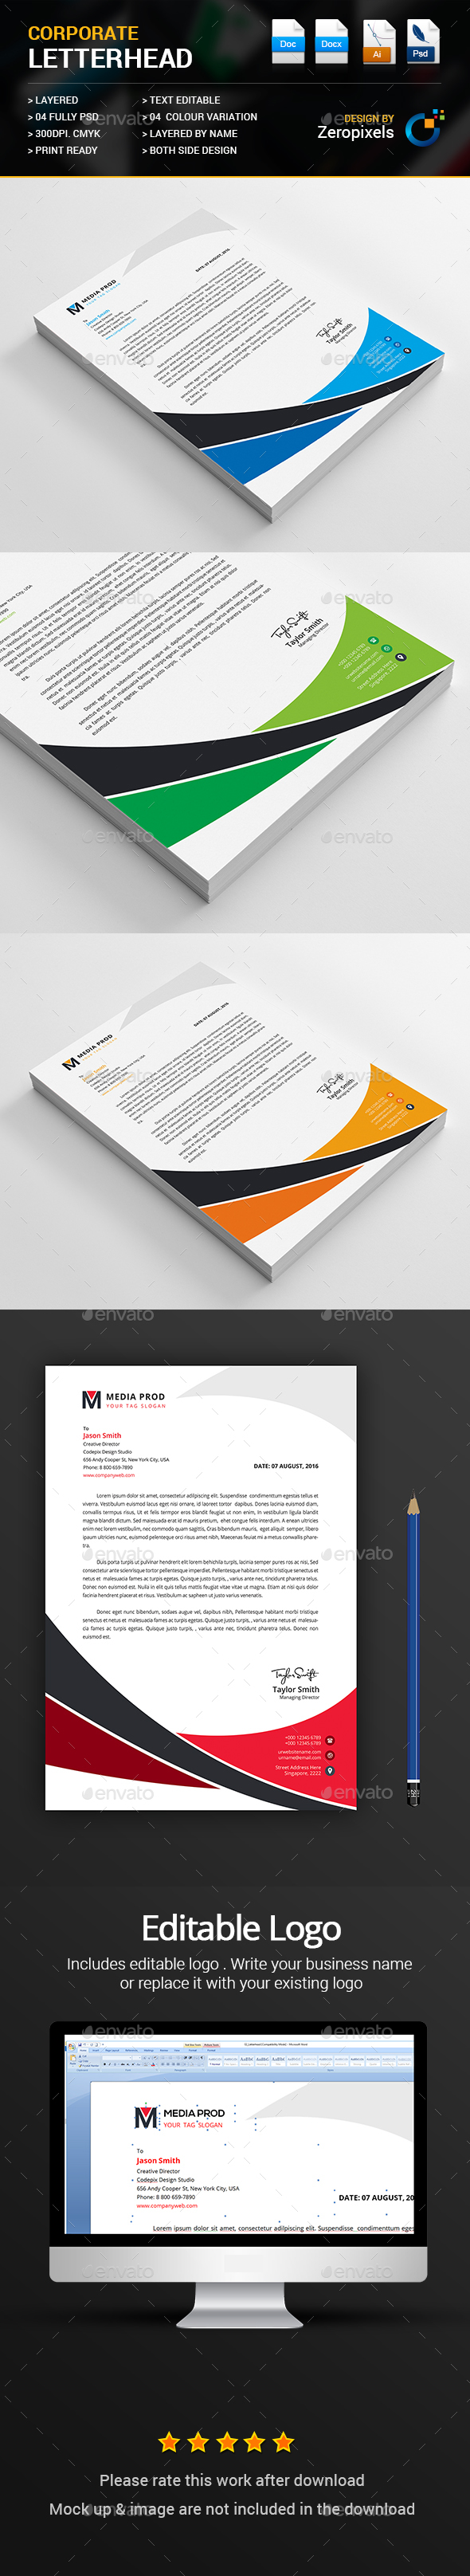 Business letterhead template psd vector eps ai ms word business letterhead spiritdancerdesigns Choice Image